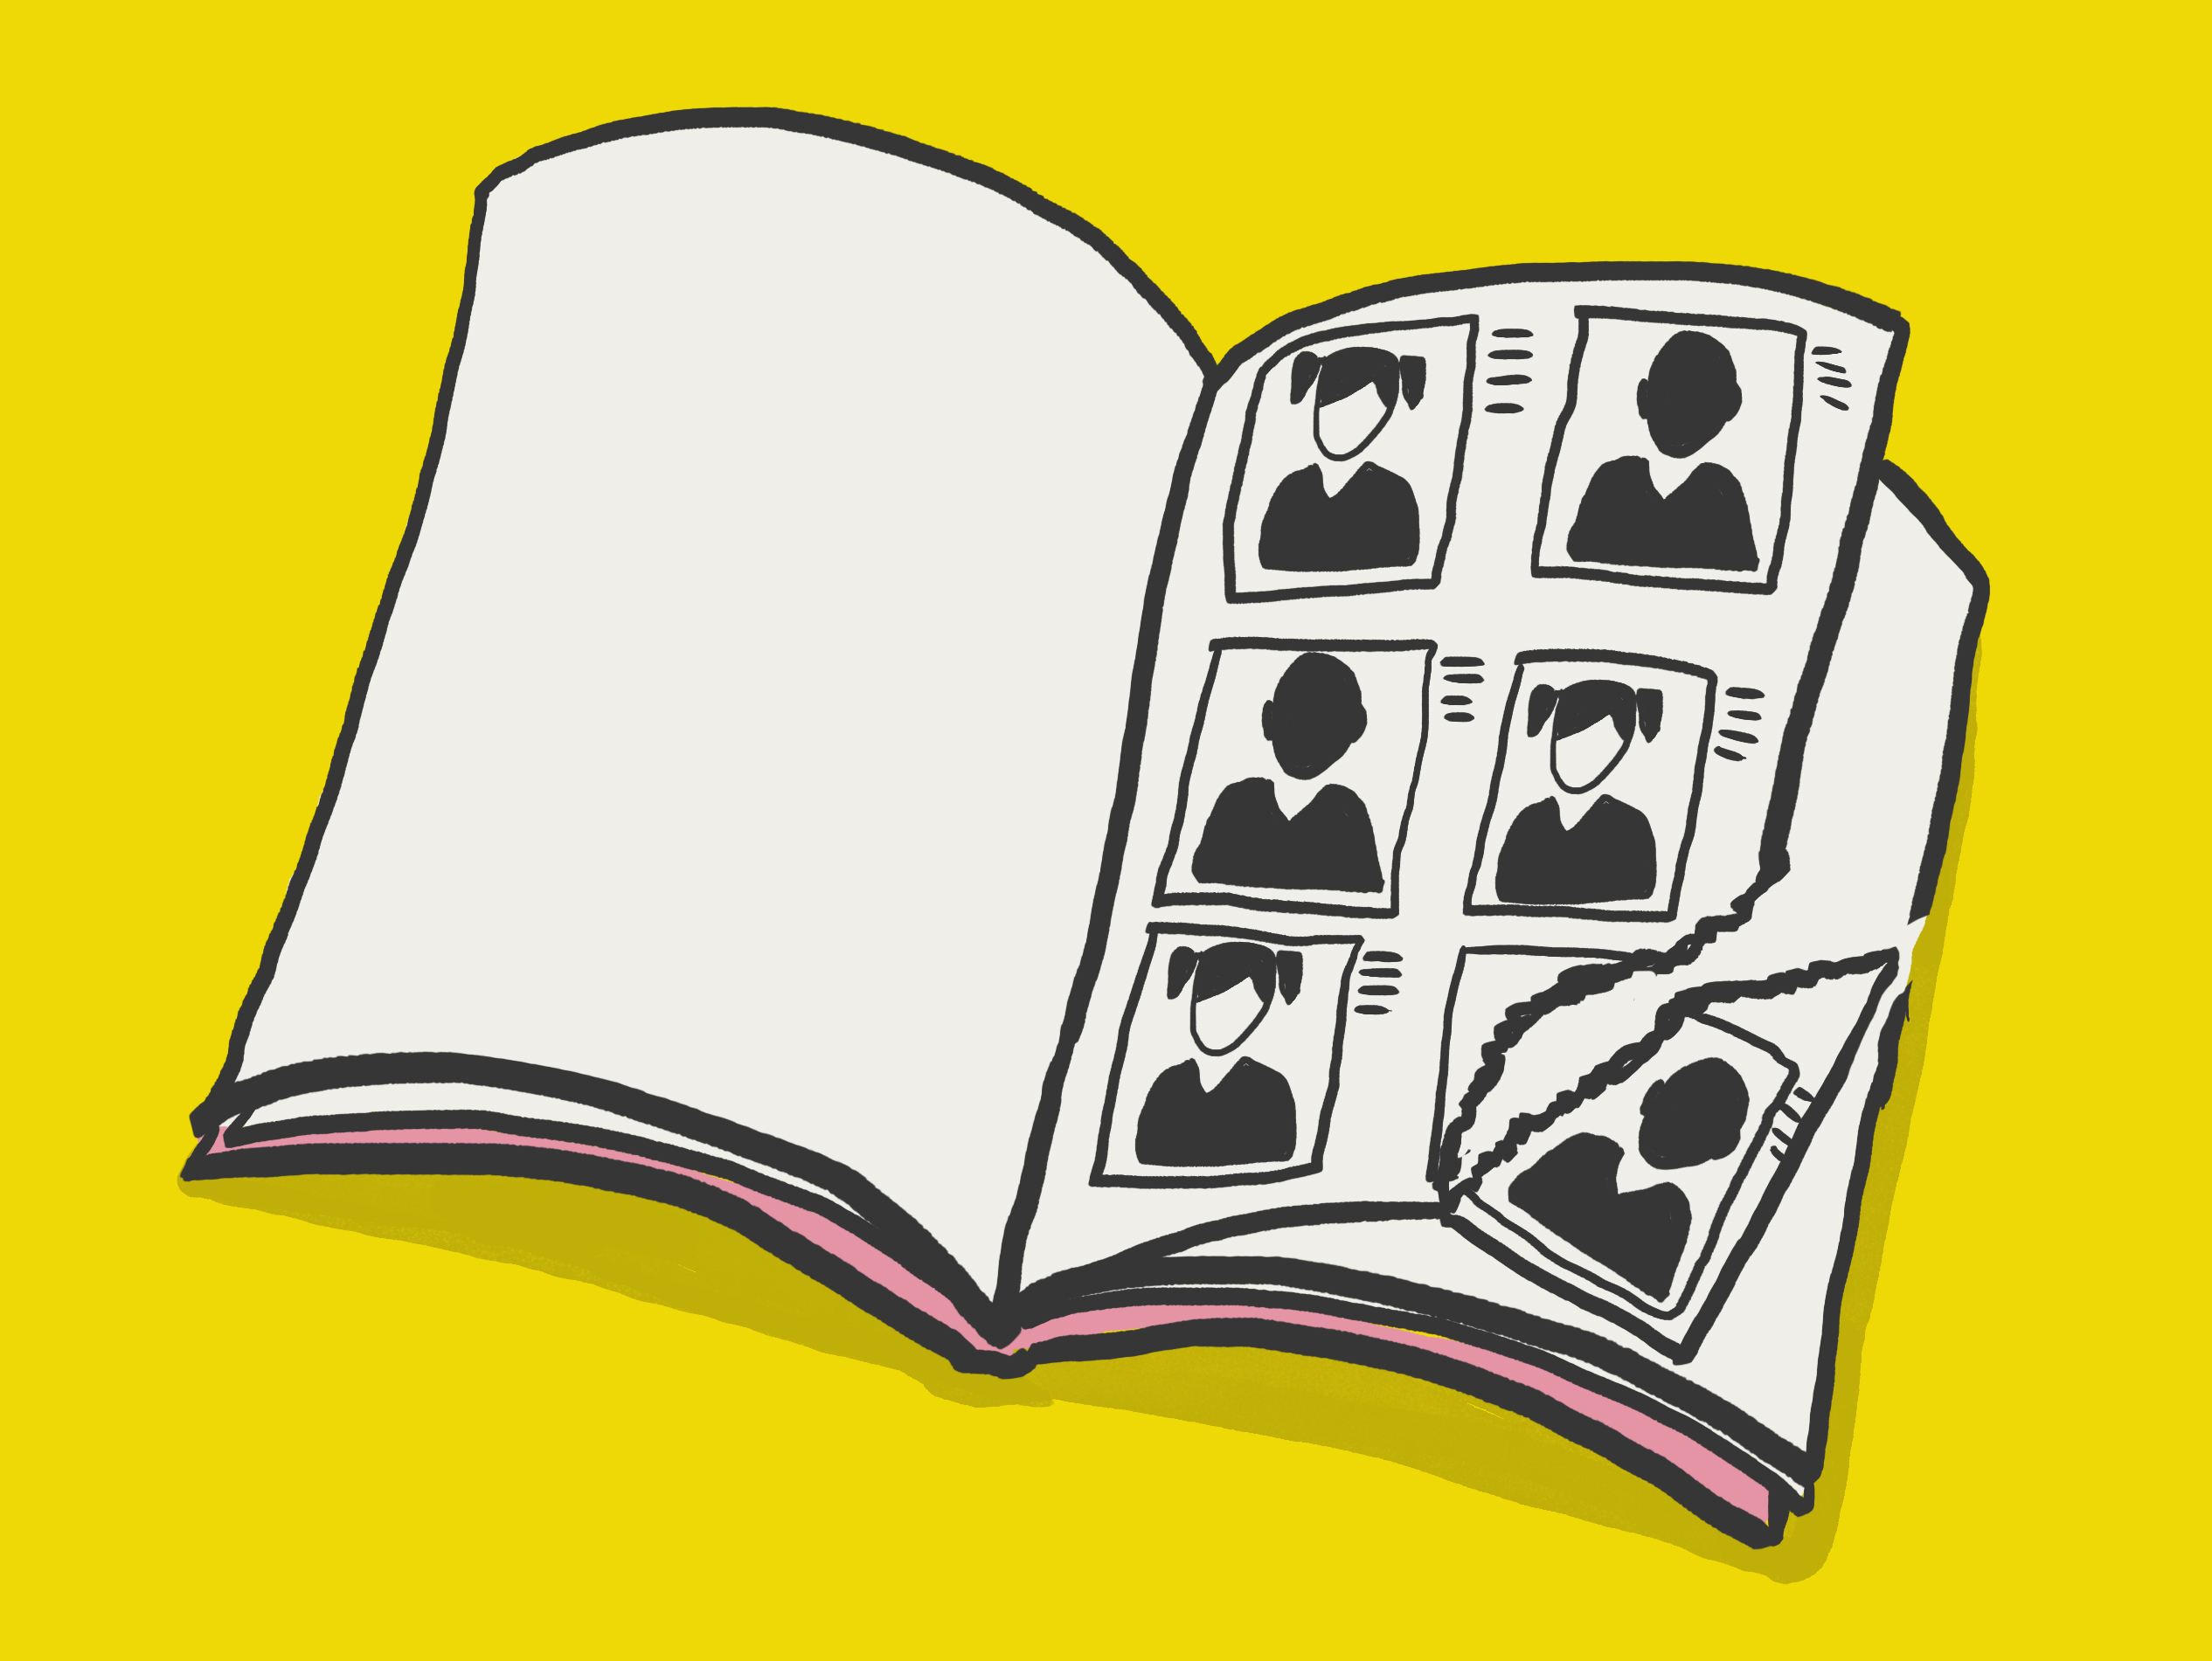 Raising Graduation Rates With Questionable Quick Fixes